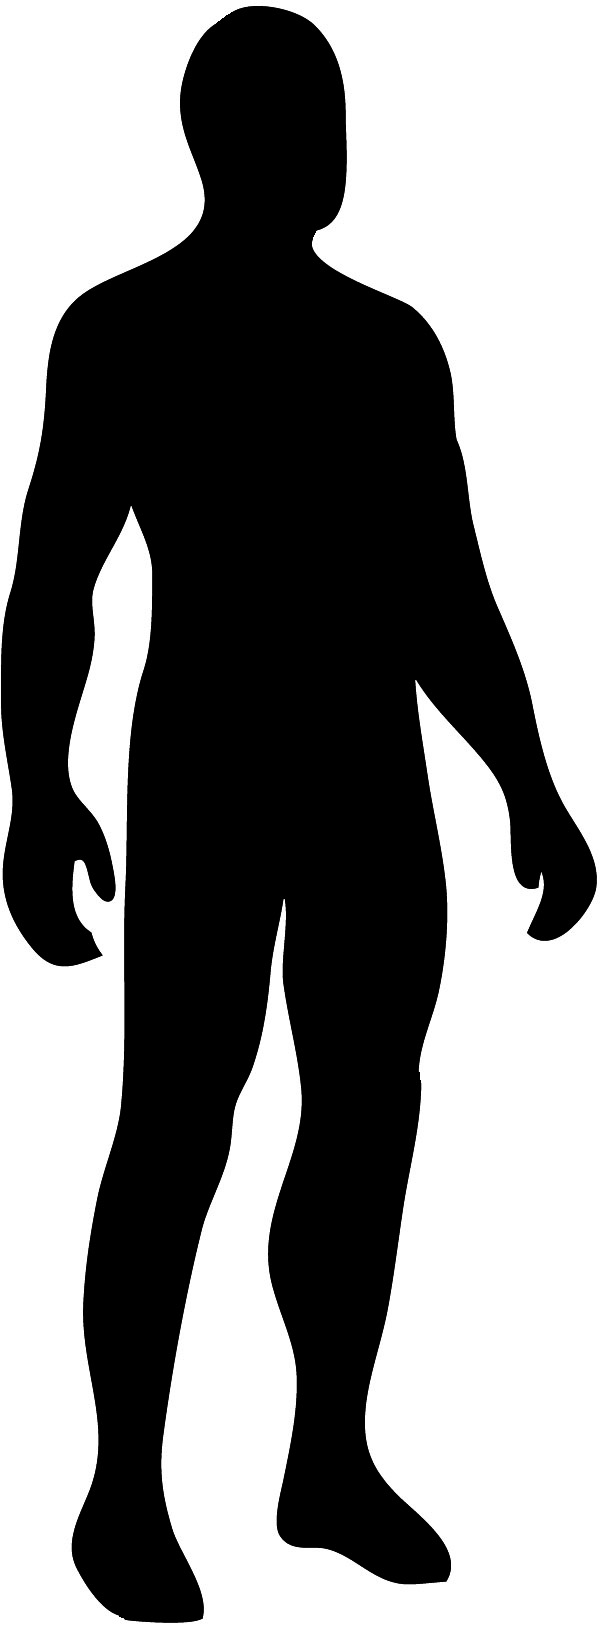 600x1627 Body Silhouettes